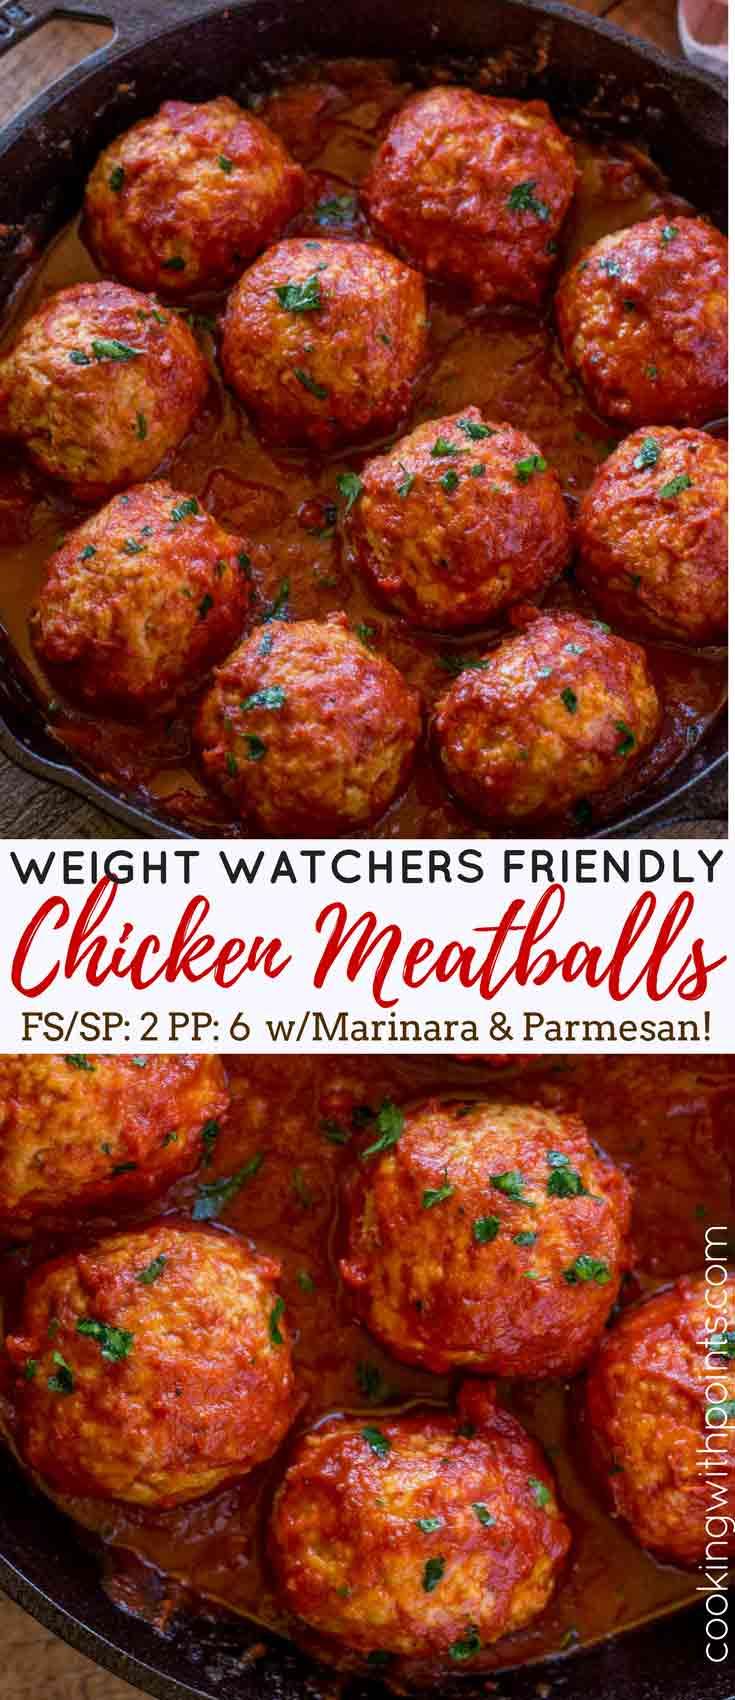 Baked Chicken Meatballs in Marinara Sauce